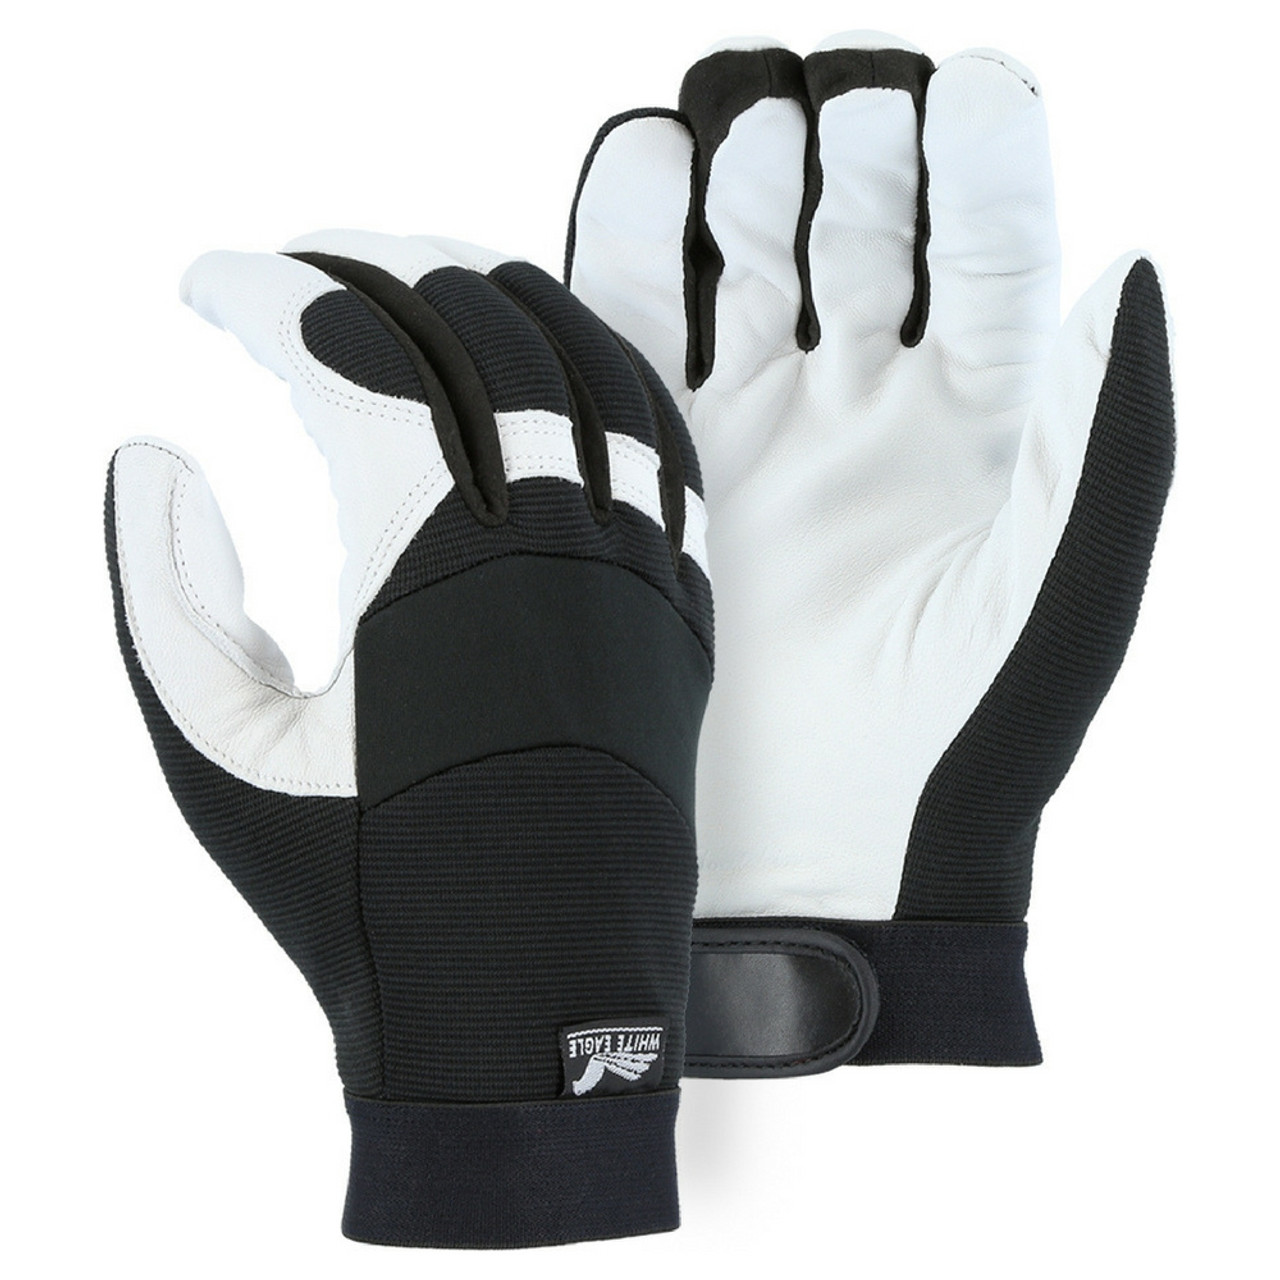 Goatskin Mechanic Gloves